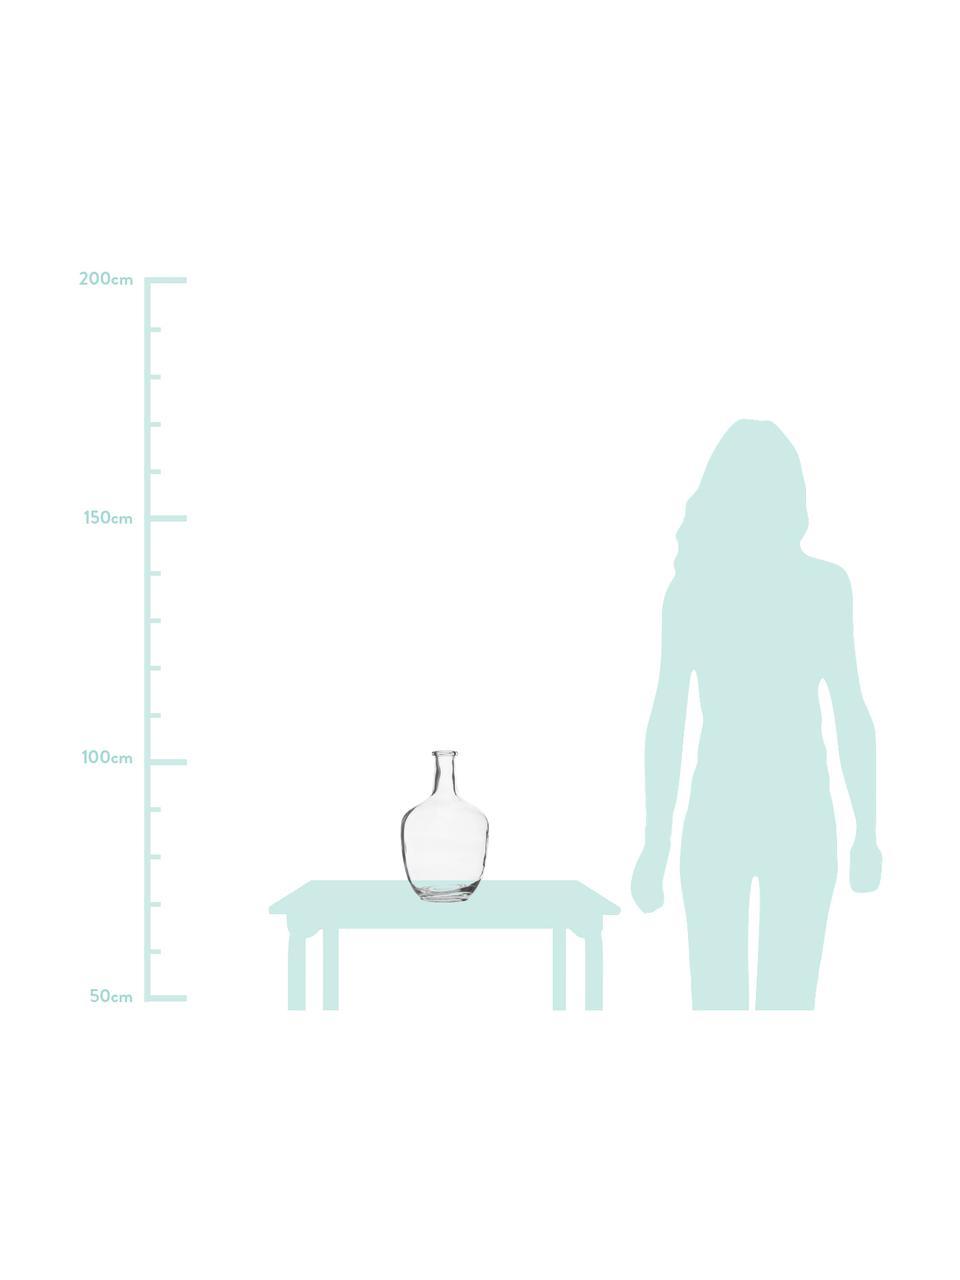 Grote glazen vaas Glassyia, Glas, Transparant, Ø 17 x H 31 cm